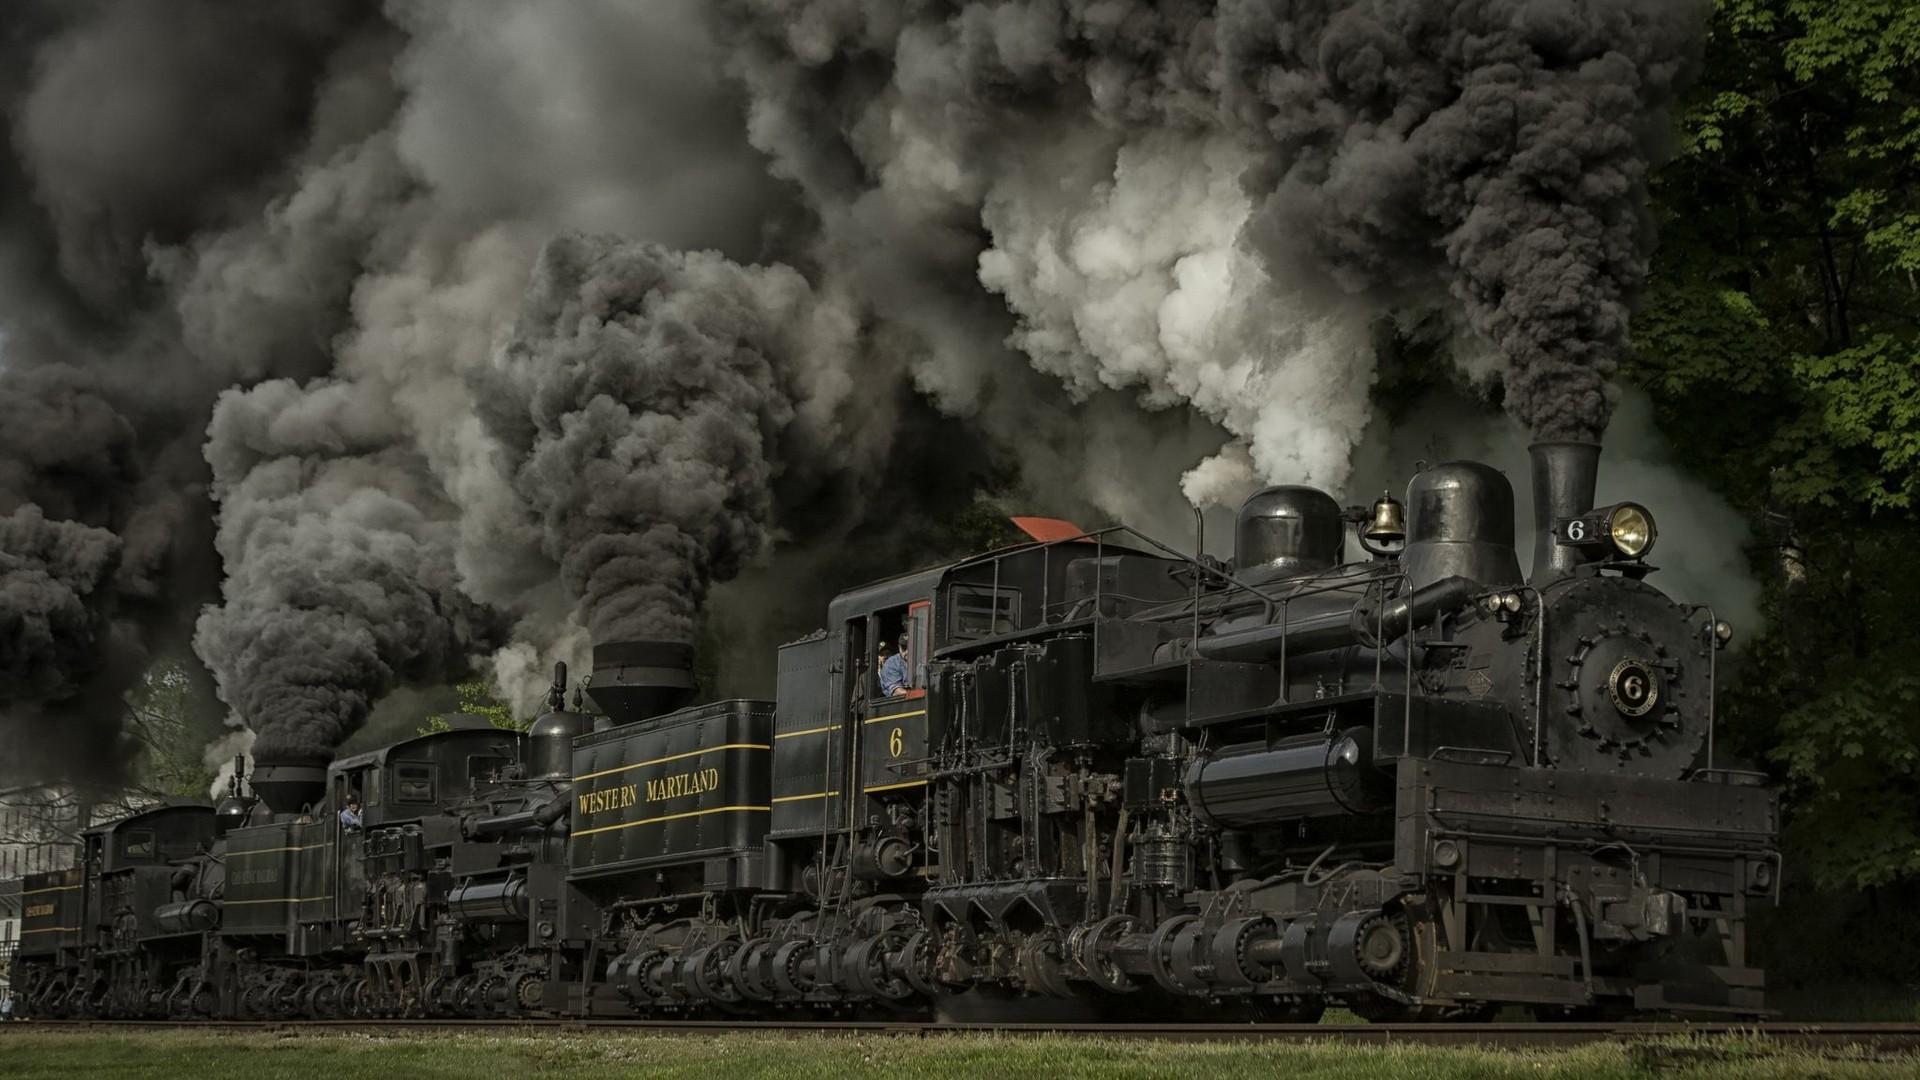 Обои на рабочий стол 1366х768 локомотивы